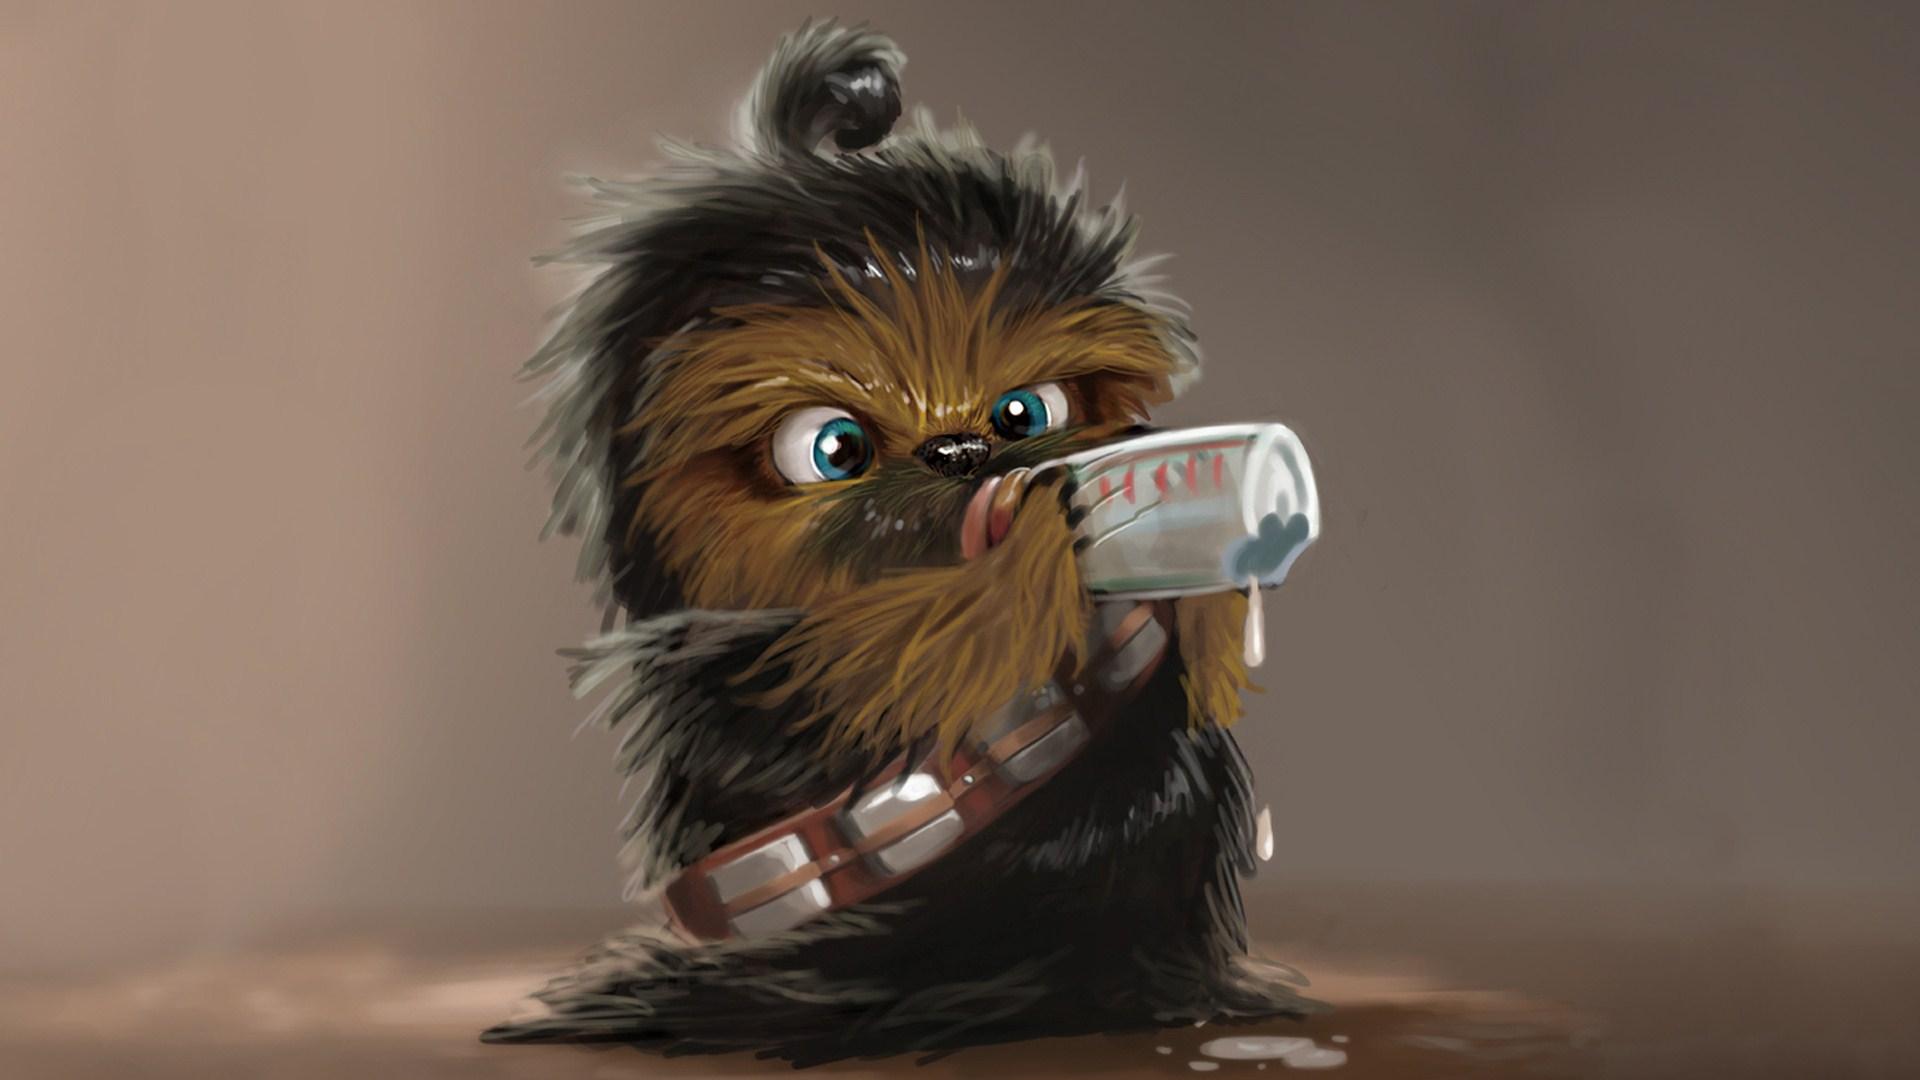 Angry Birds Star Wars wallpaper 3